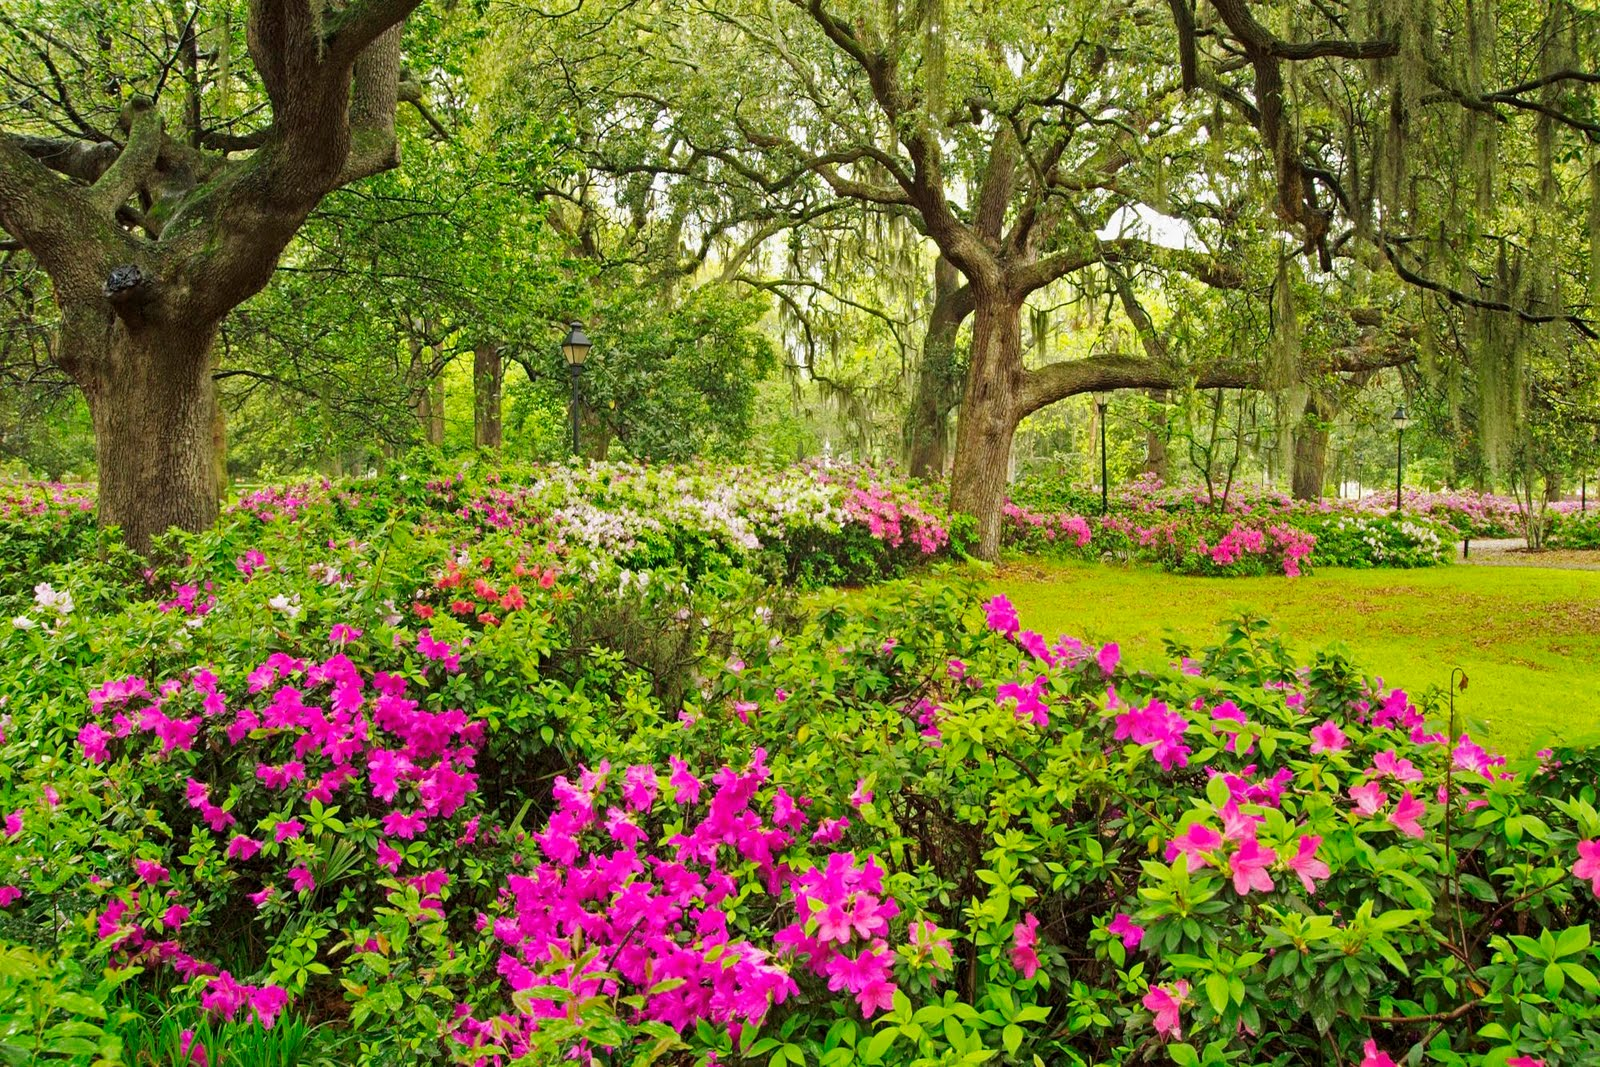 Beautiful Backyard Flower Gardens : Beautiful flower garden, flower forest cool wallpapers, wonderful